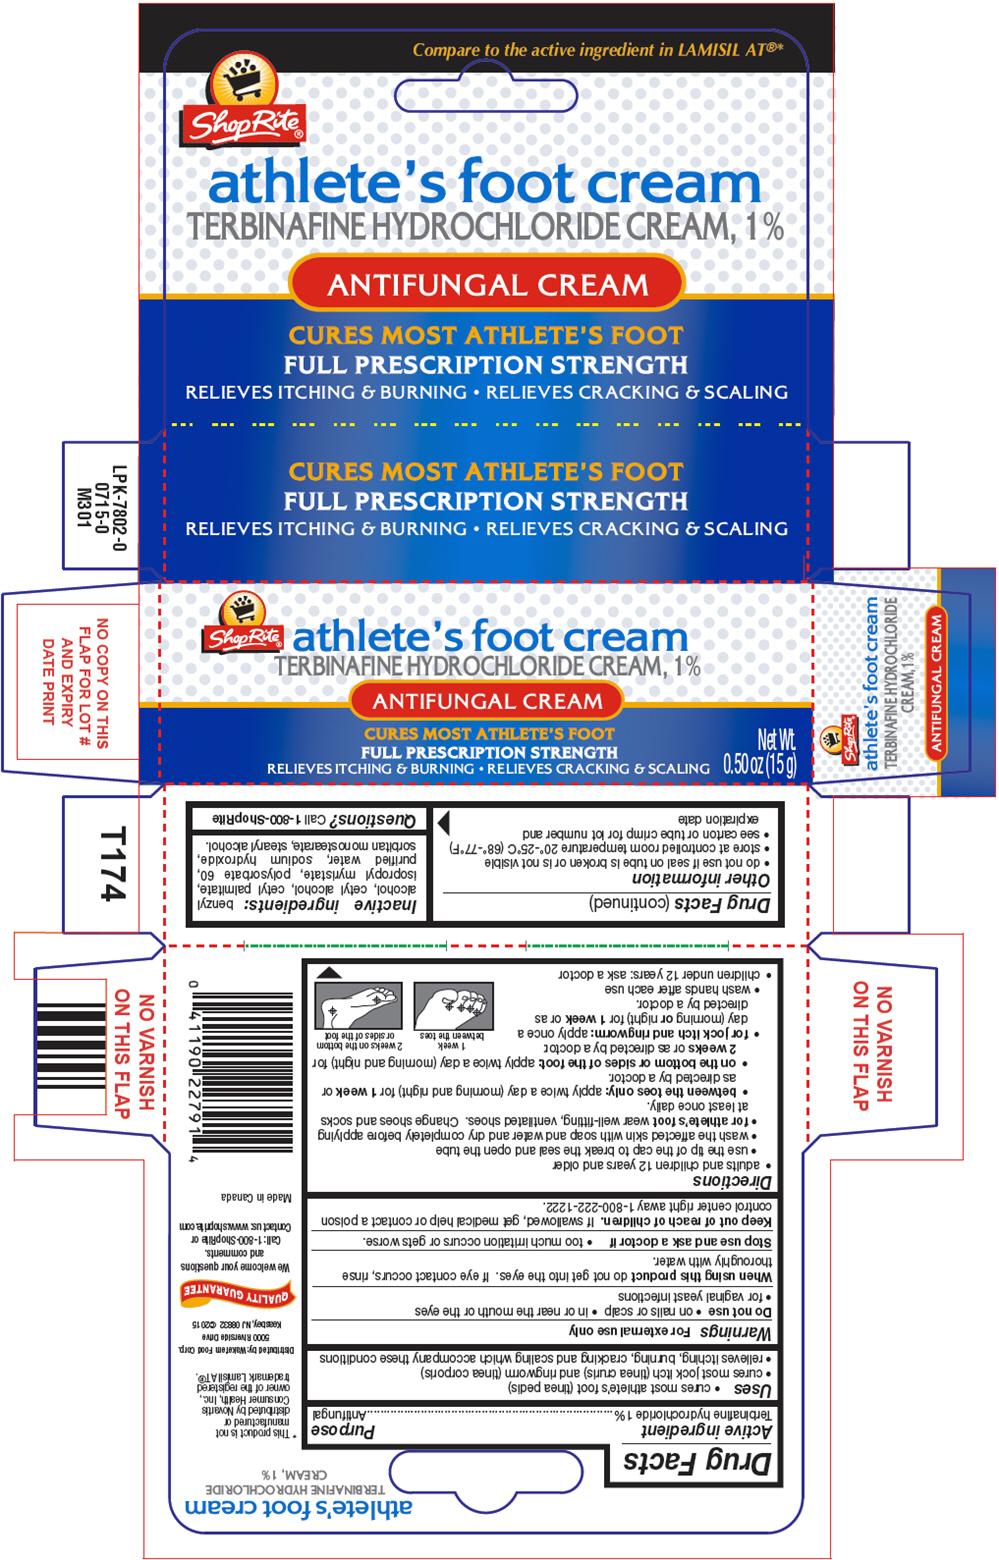 Shoprite (Terbinafine Hydrochloride) Cream [Wakefern Food Corporation]